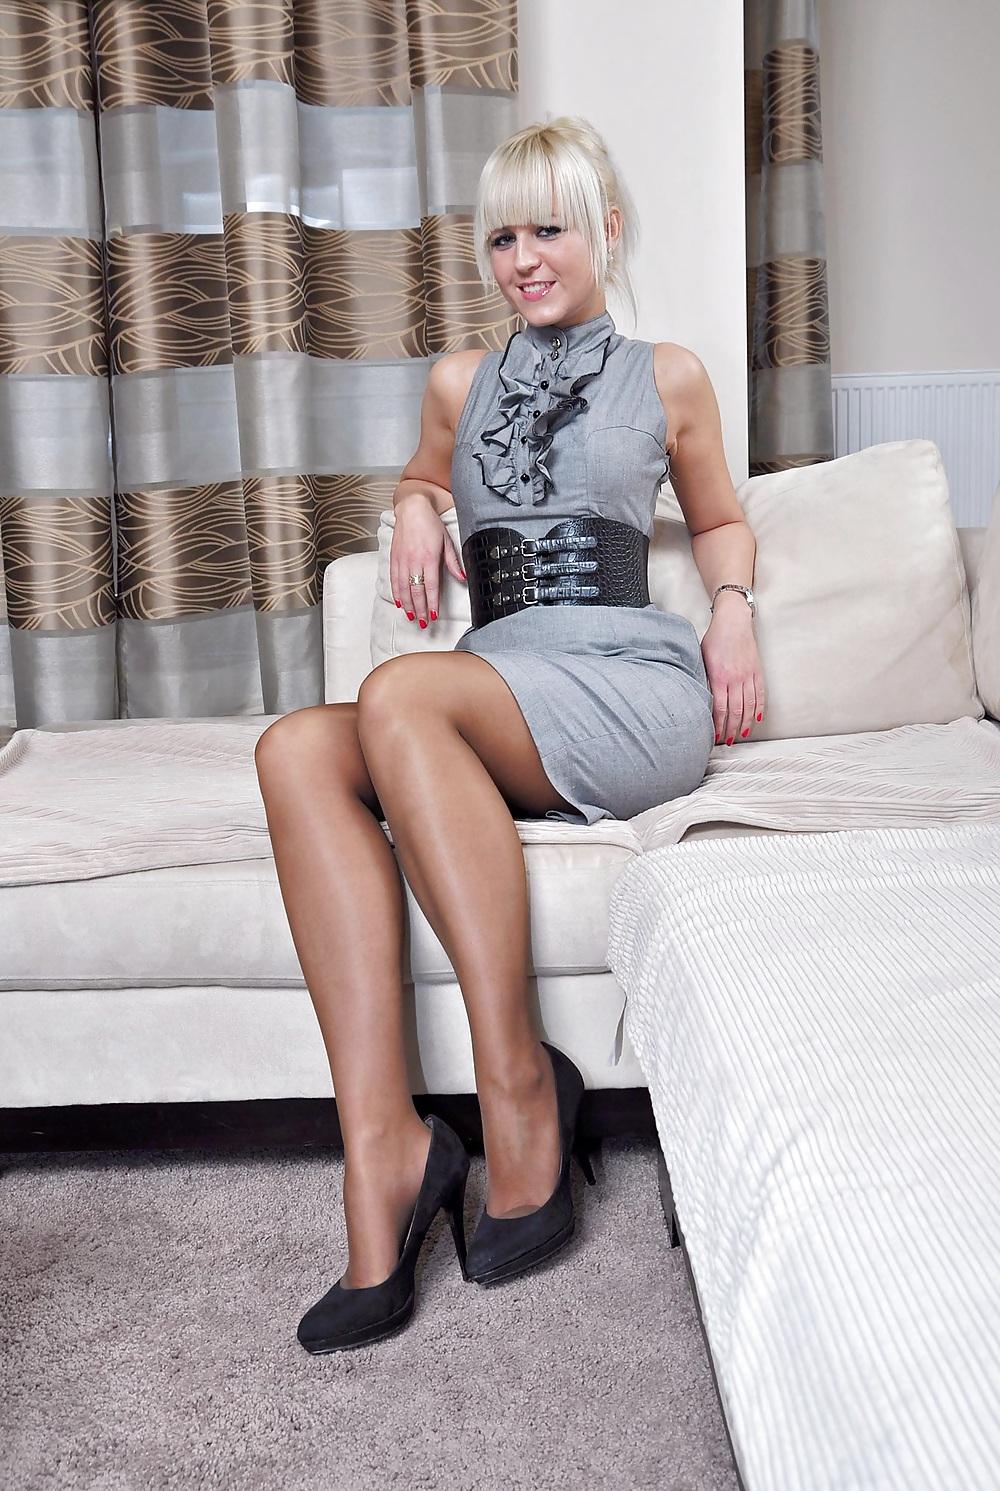 Porn Pics Amateur Woman shows Pantyhosefeet 15